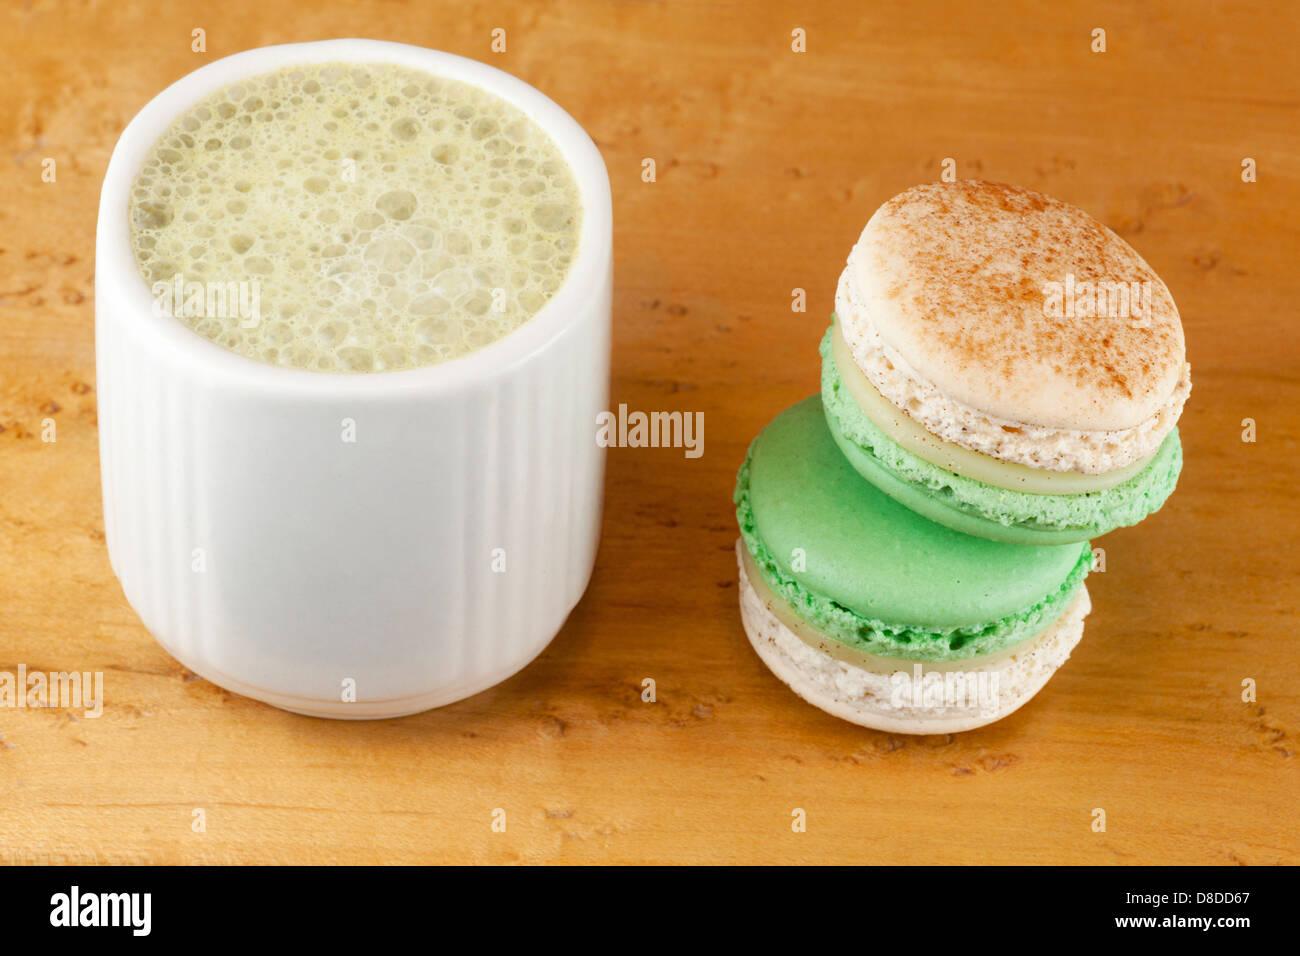 Matcha latte made with almond milk, and apple-cinnamon macarons - Stock Image